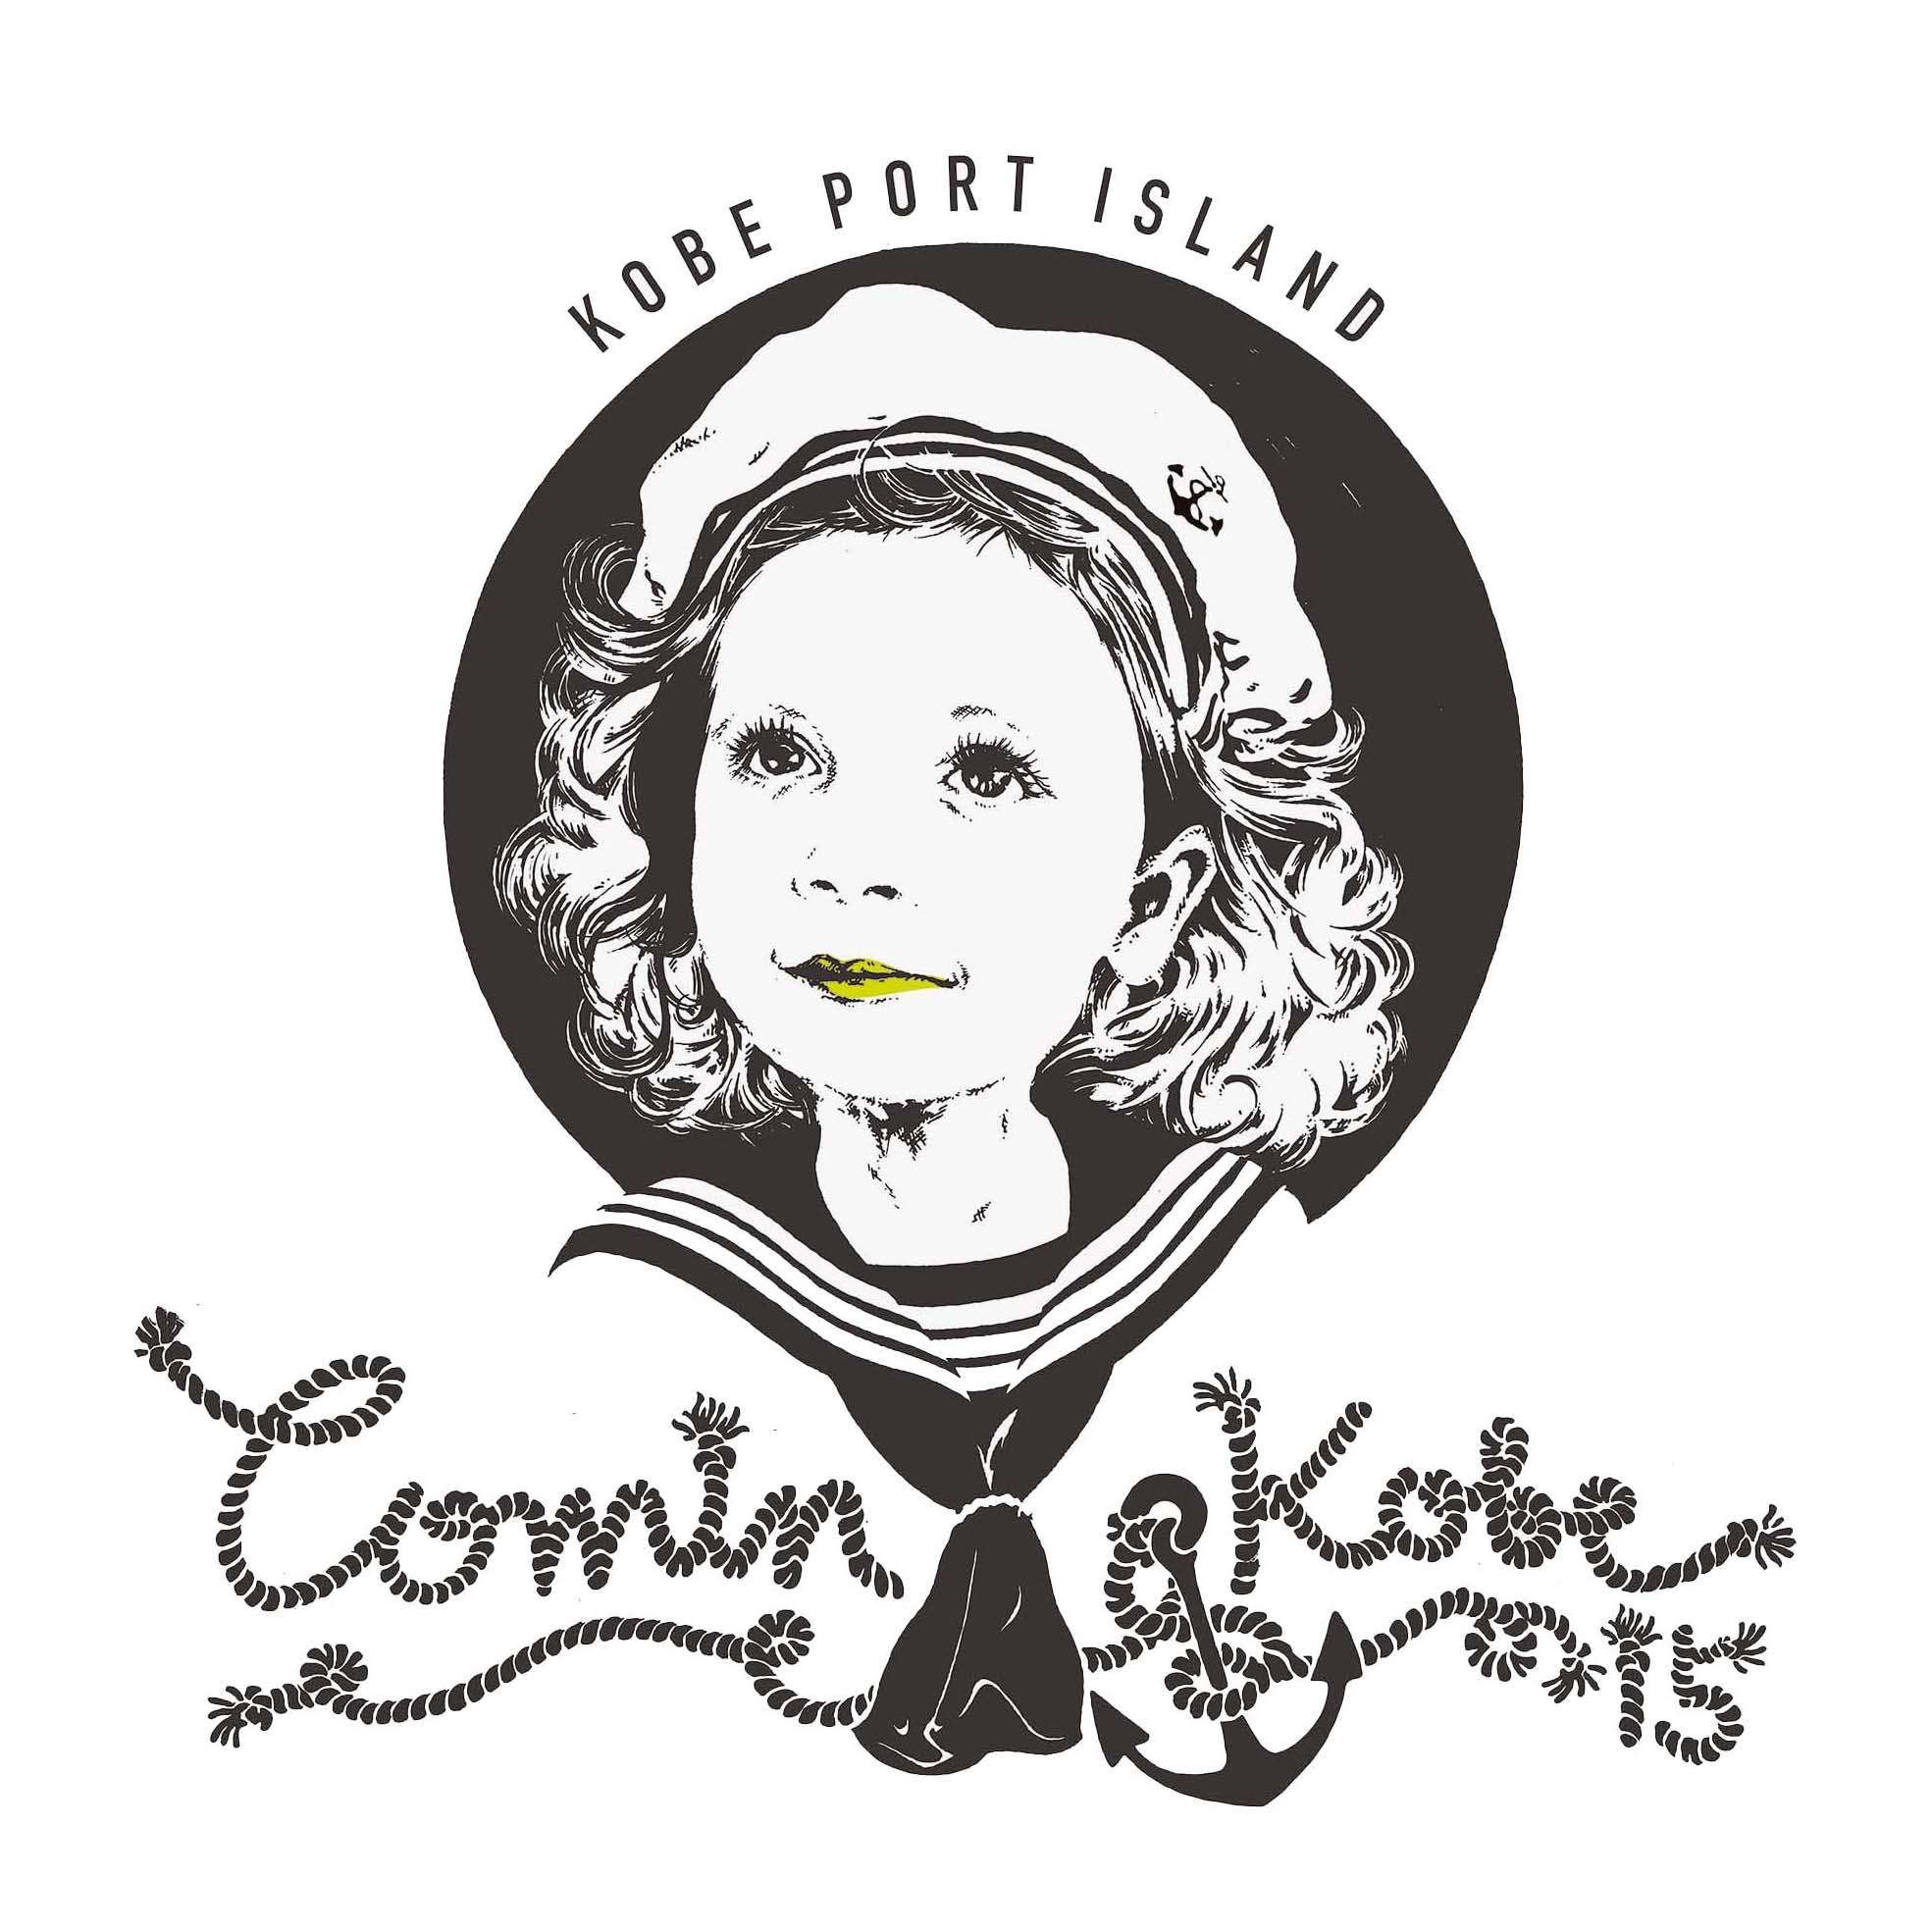 COMIN'KOBE 2015